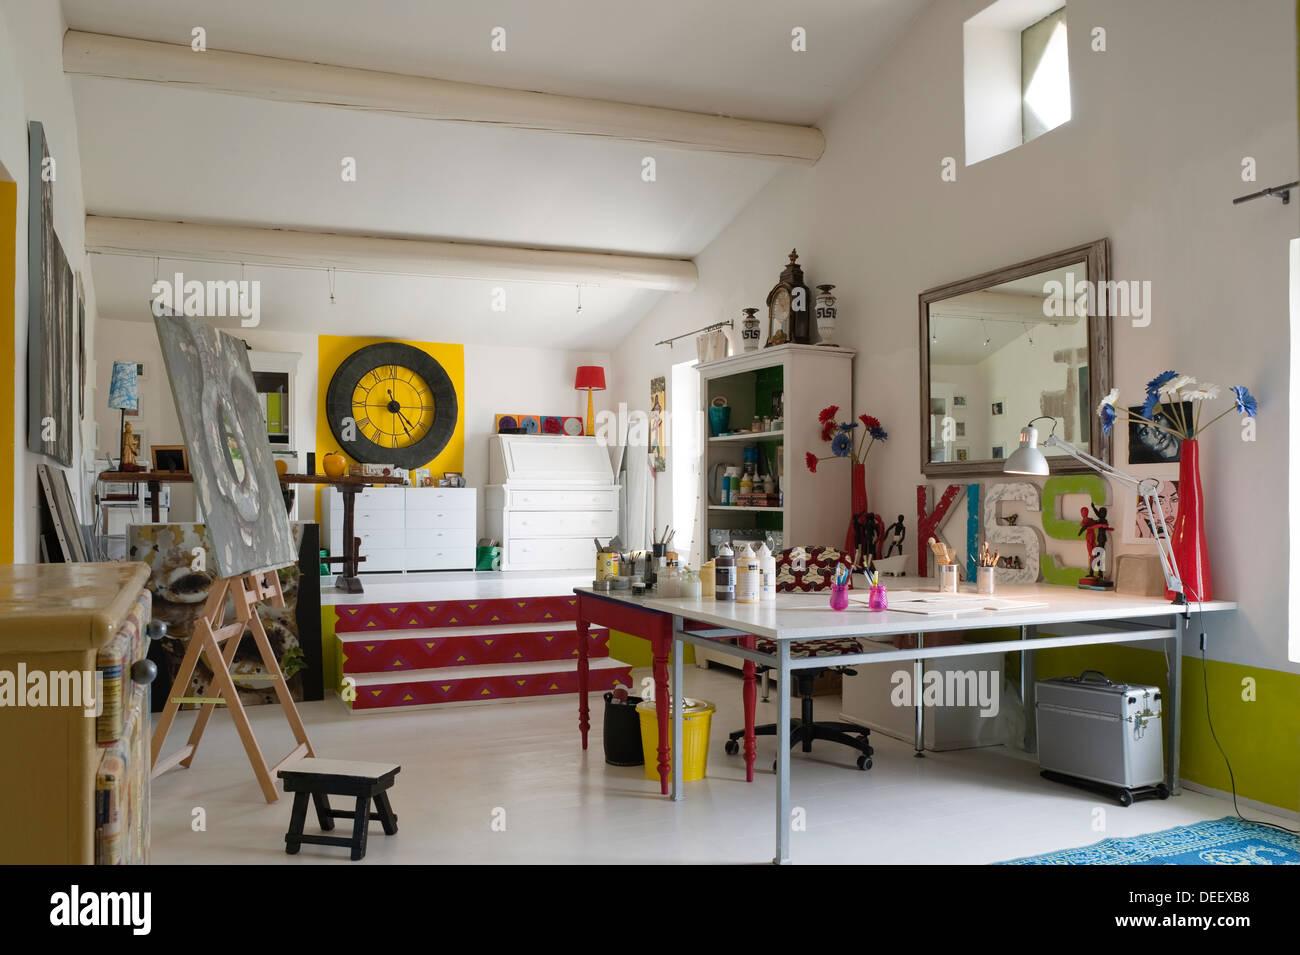 Split level artist's studio atelier with plan table and plenty of natural light - Stock Image